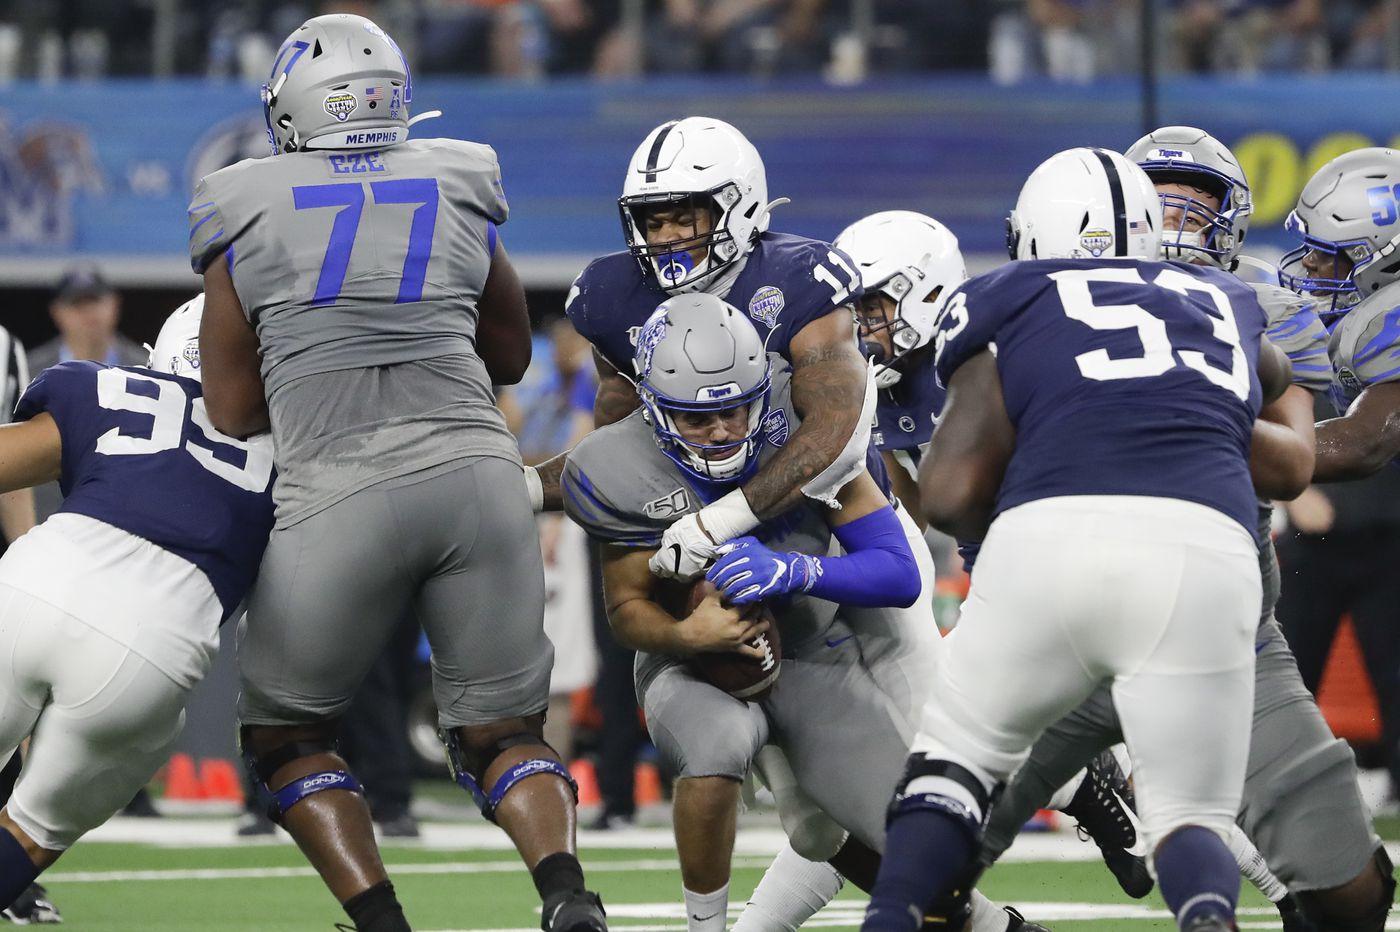 Penn State linebacker Micah Parsons sets a high standard with Cotton Bowl MVP award